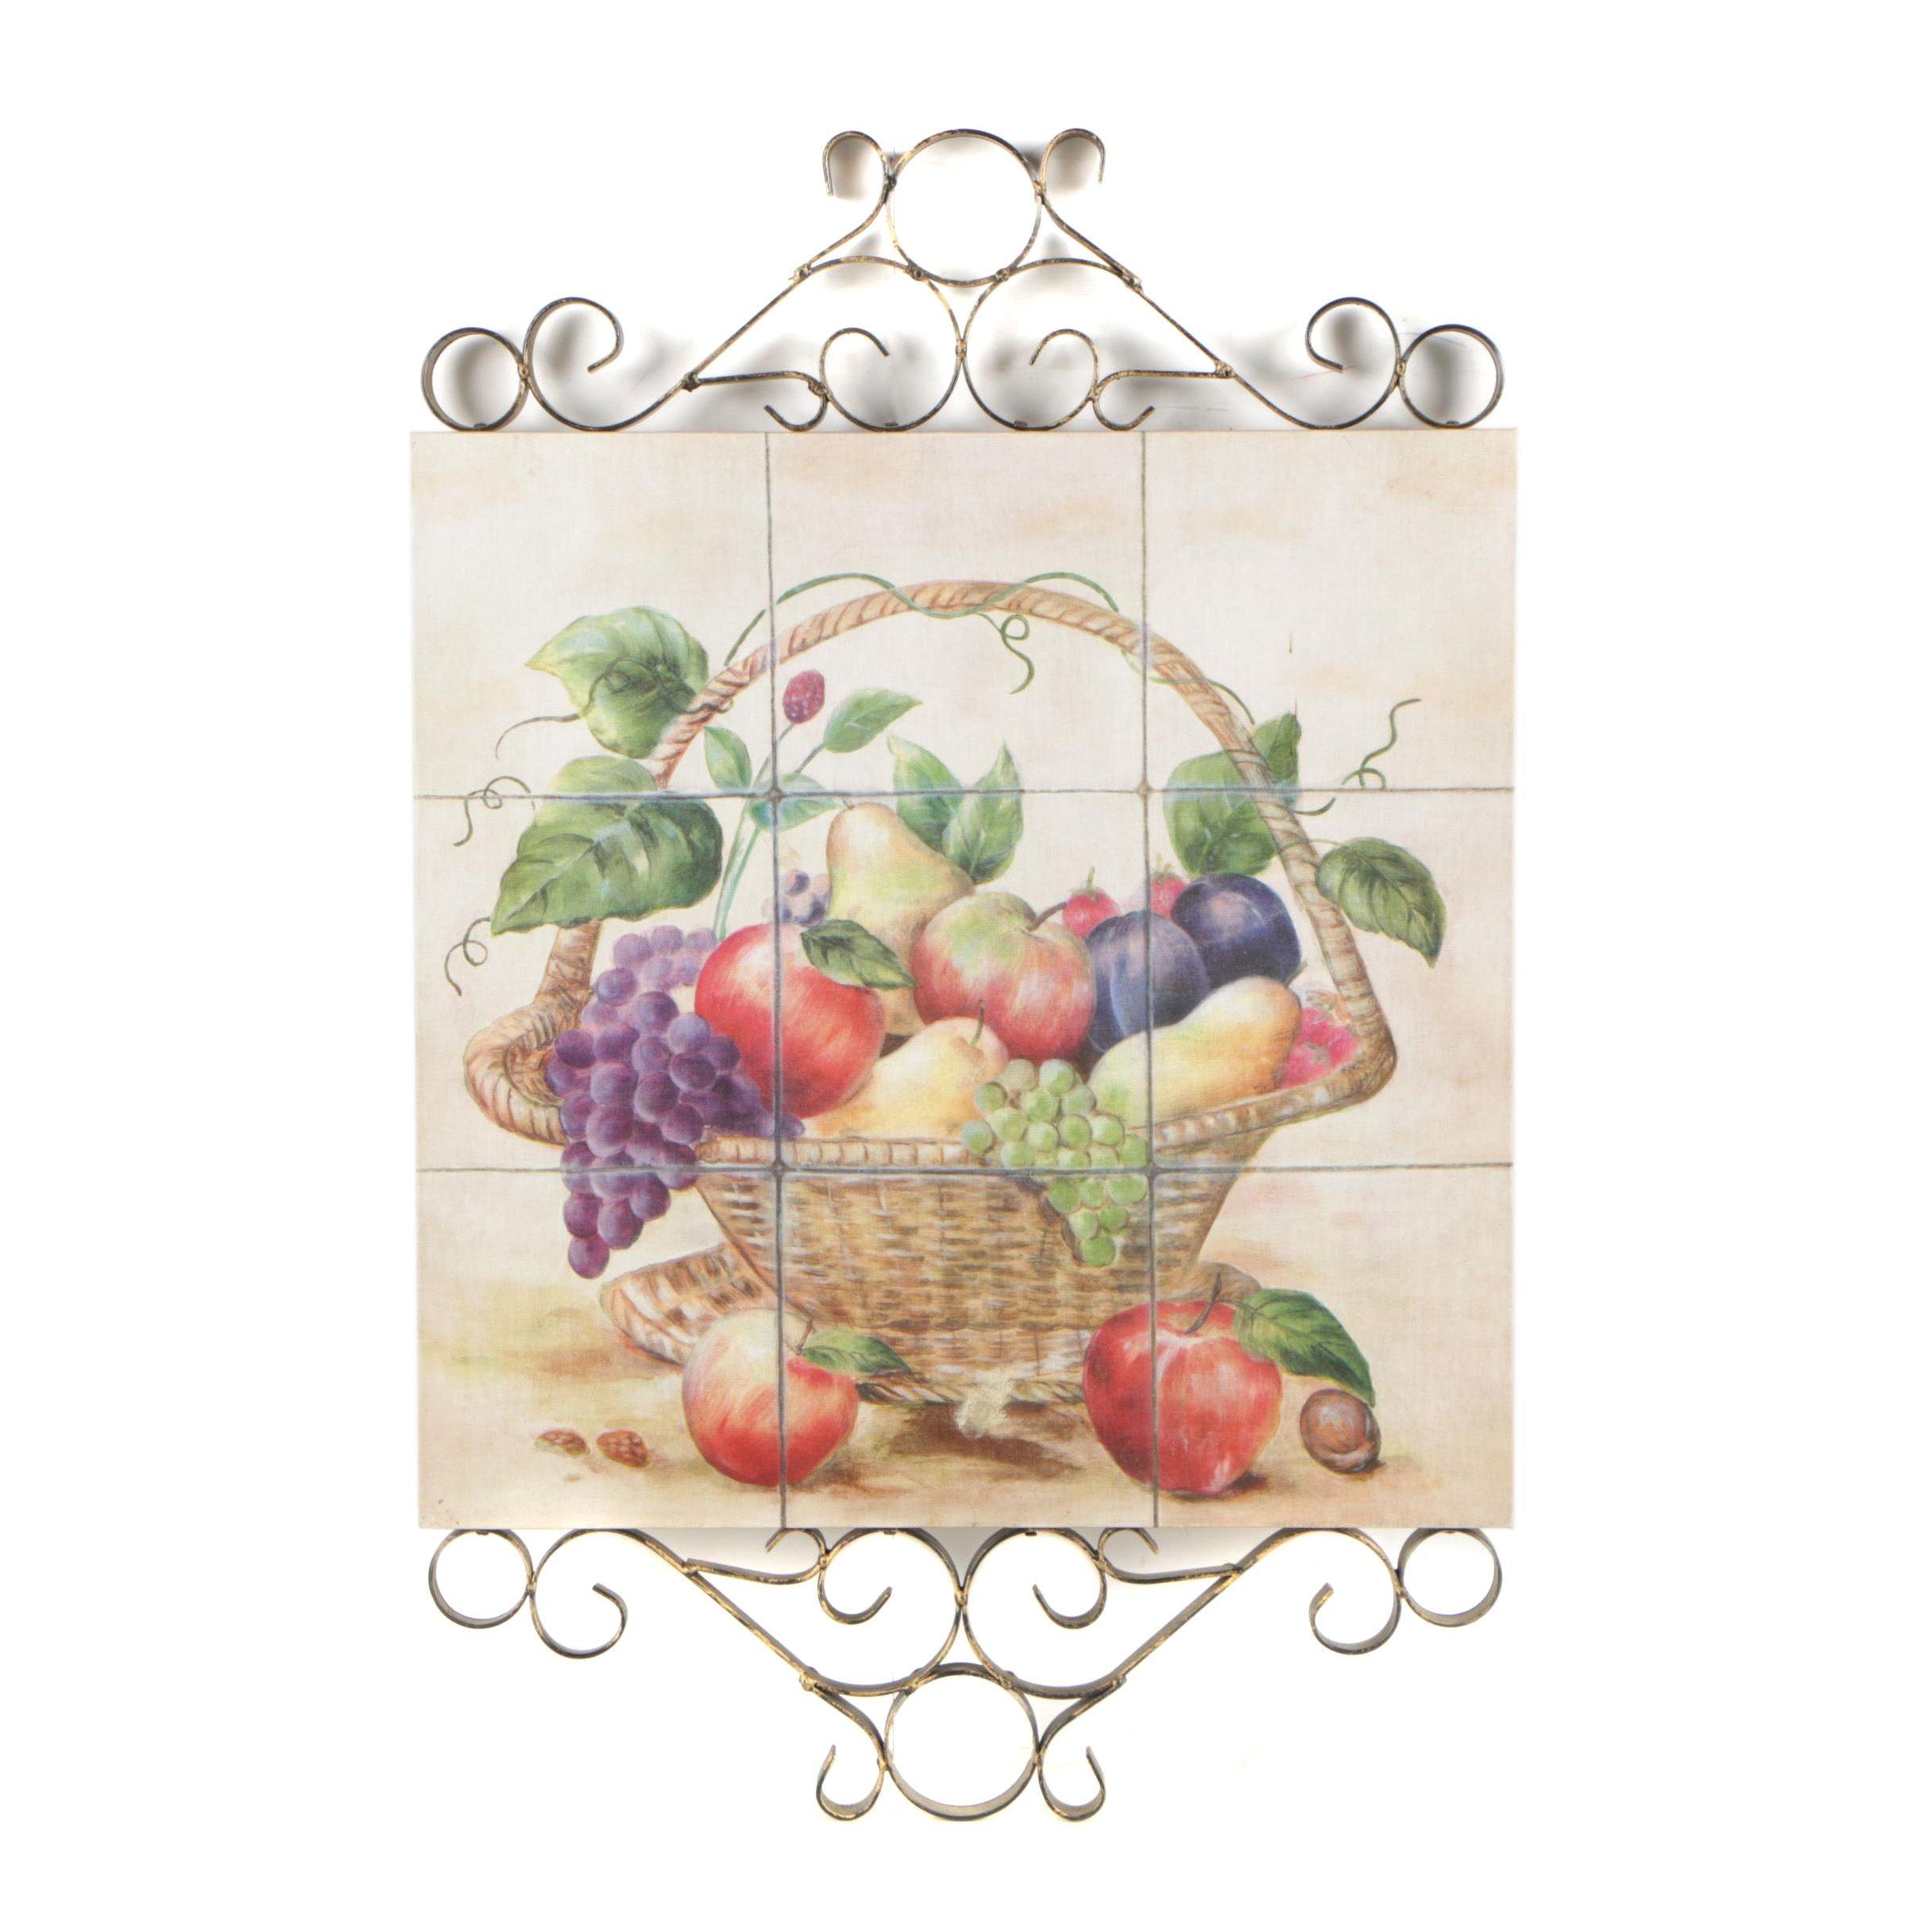 Offset Lithographic Fruit Basket Still Life Wall Decor